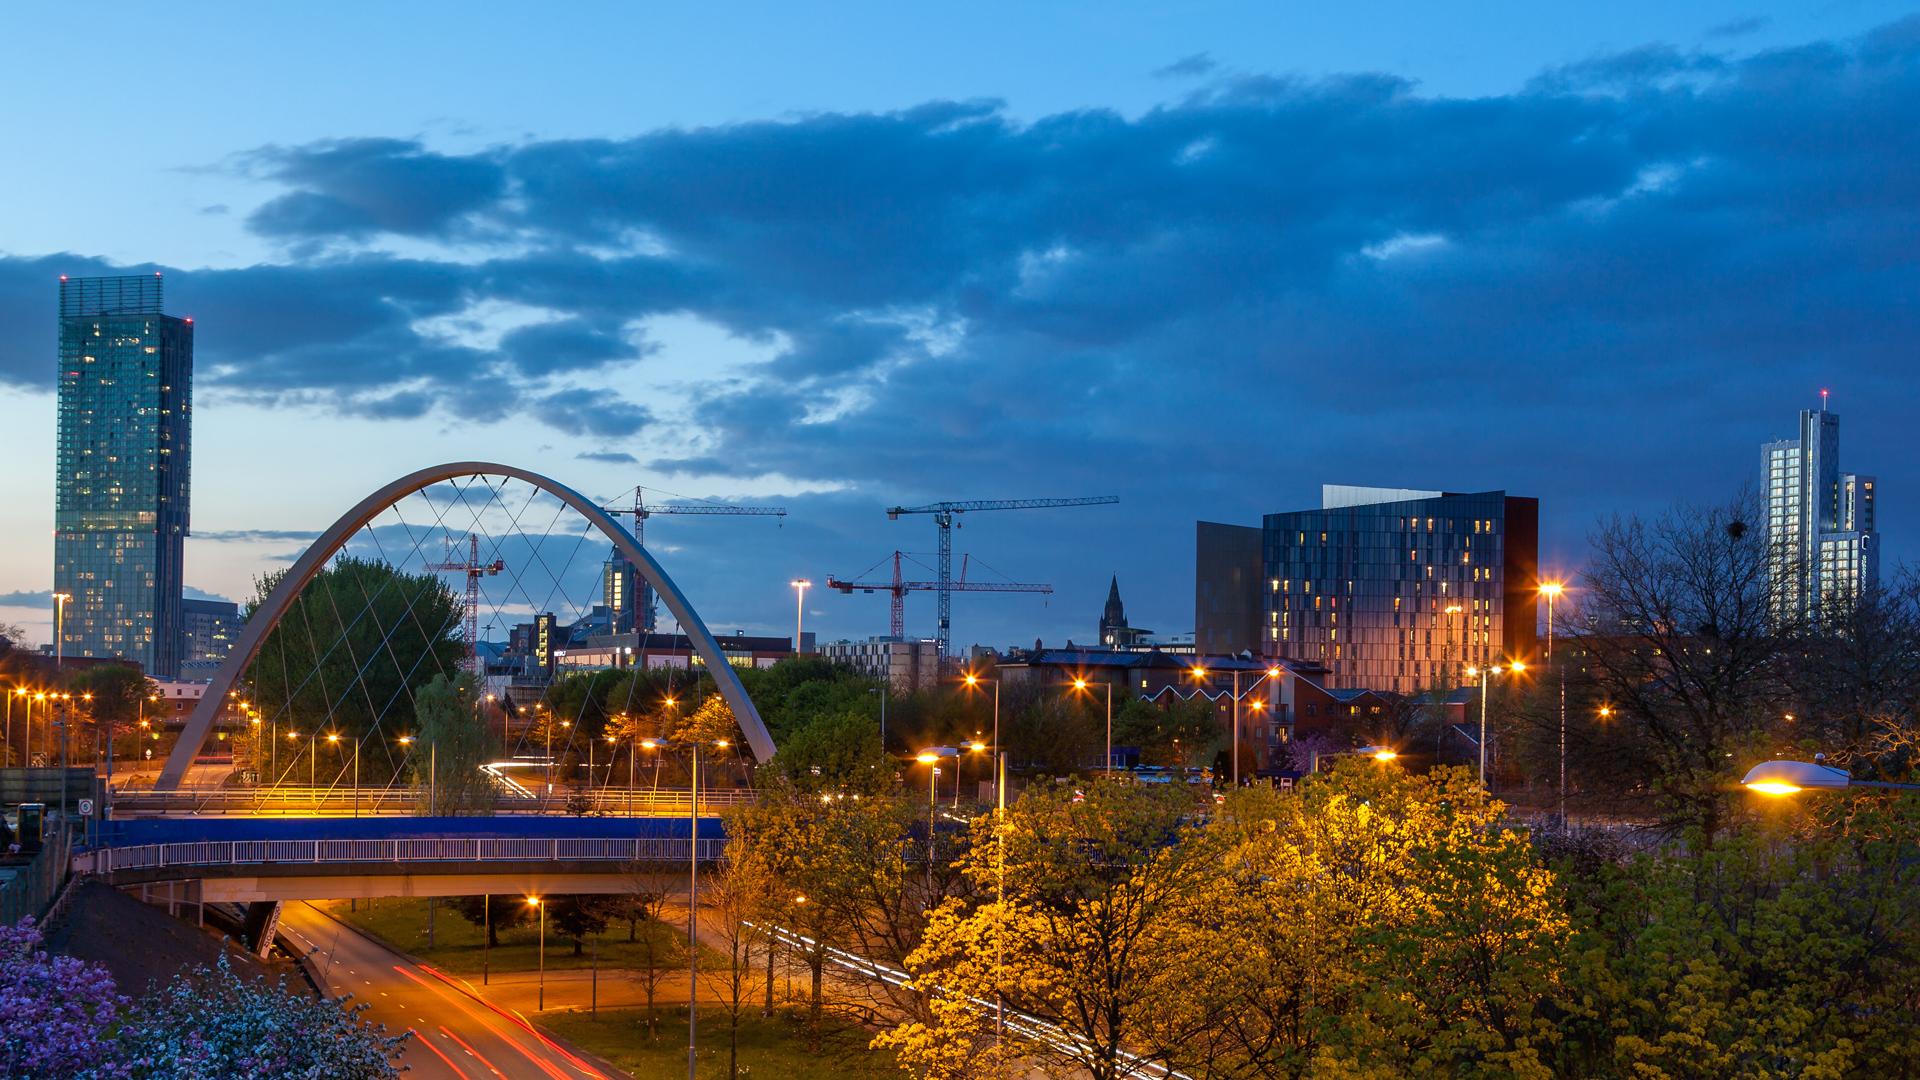 UK: Midlands